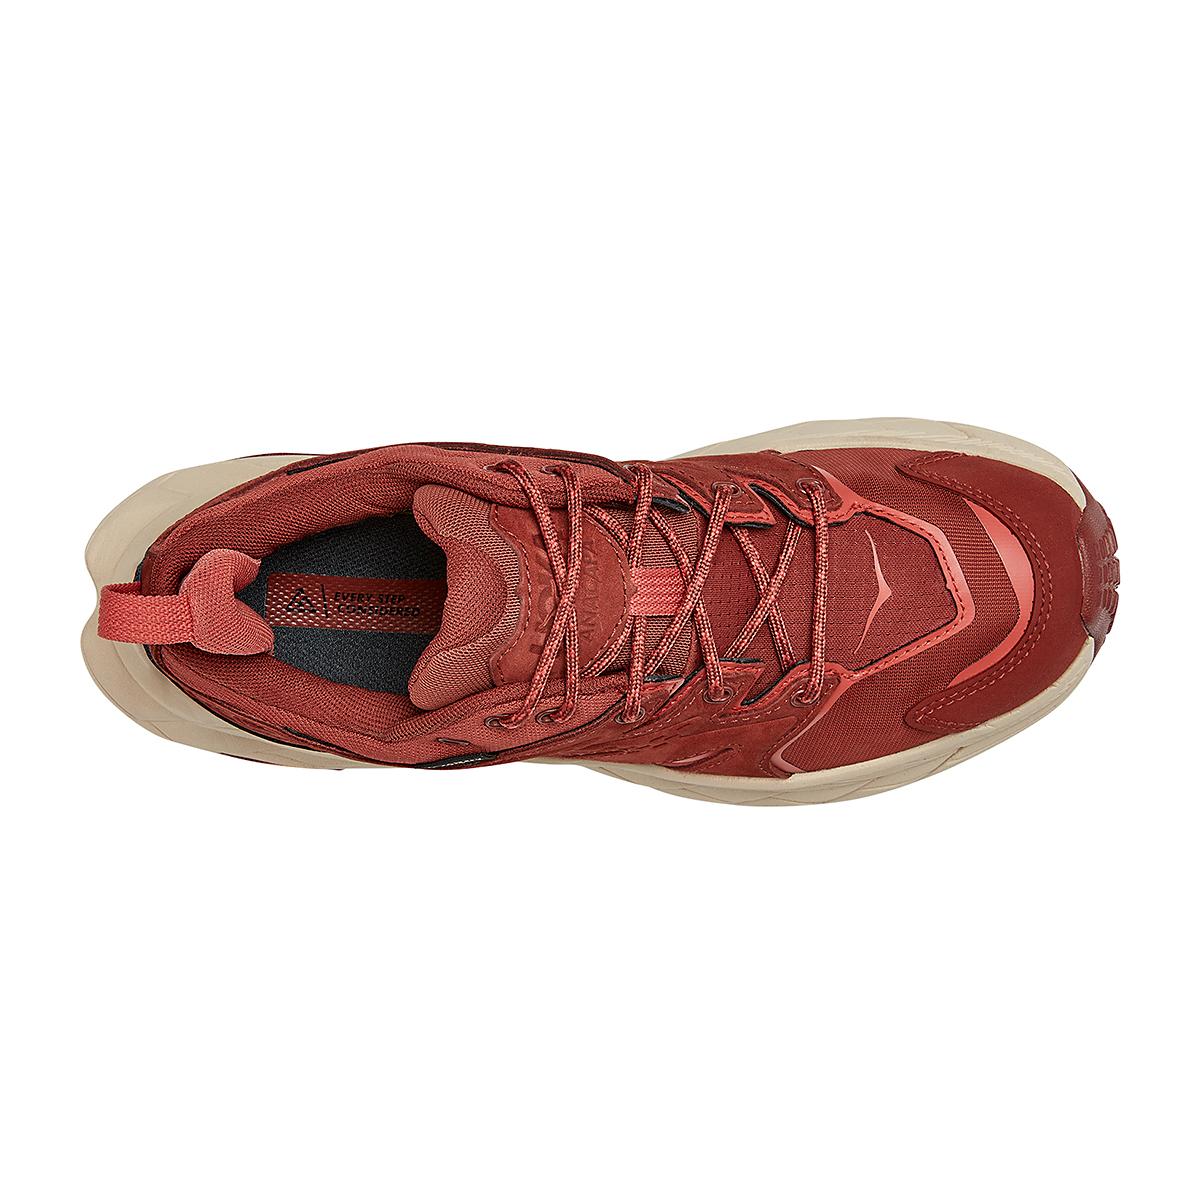 Women's Hoka One One Anacapa Low Gore-Tex Trail Running Shoe - Color: Cherry Mahogany - Size: 5 - Width: Regular, Cherry Mahogany, large, image 5